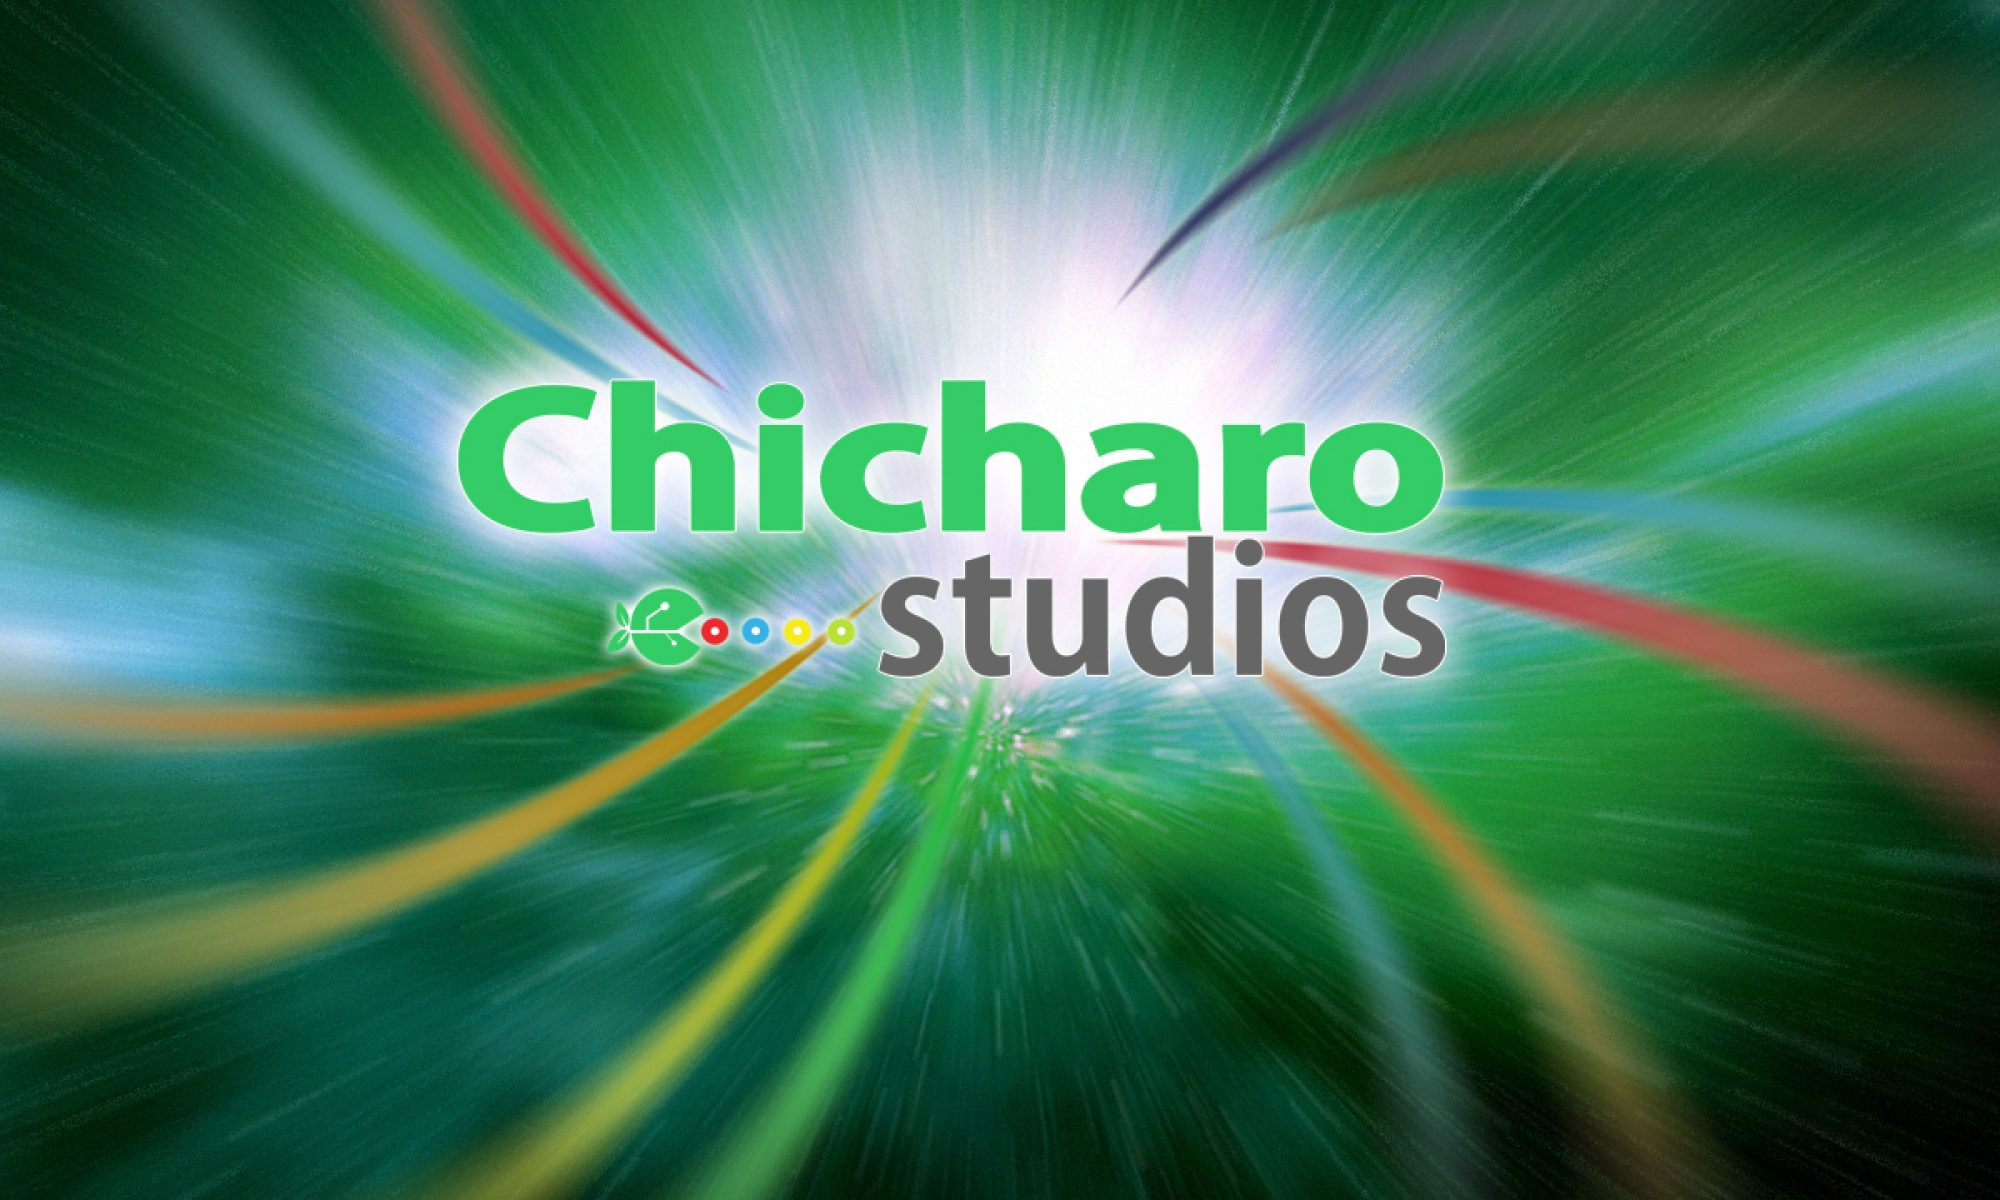 Chicharostudios